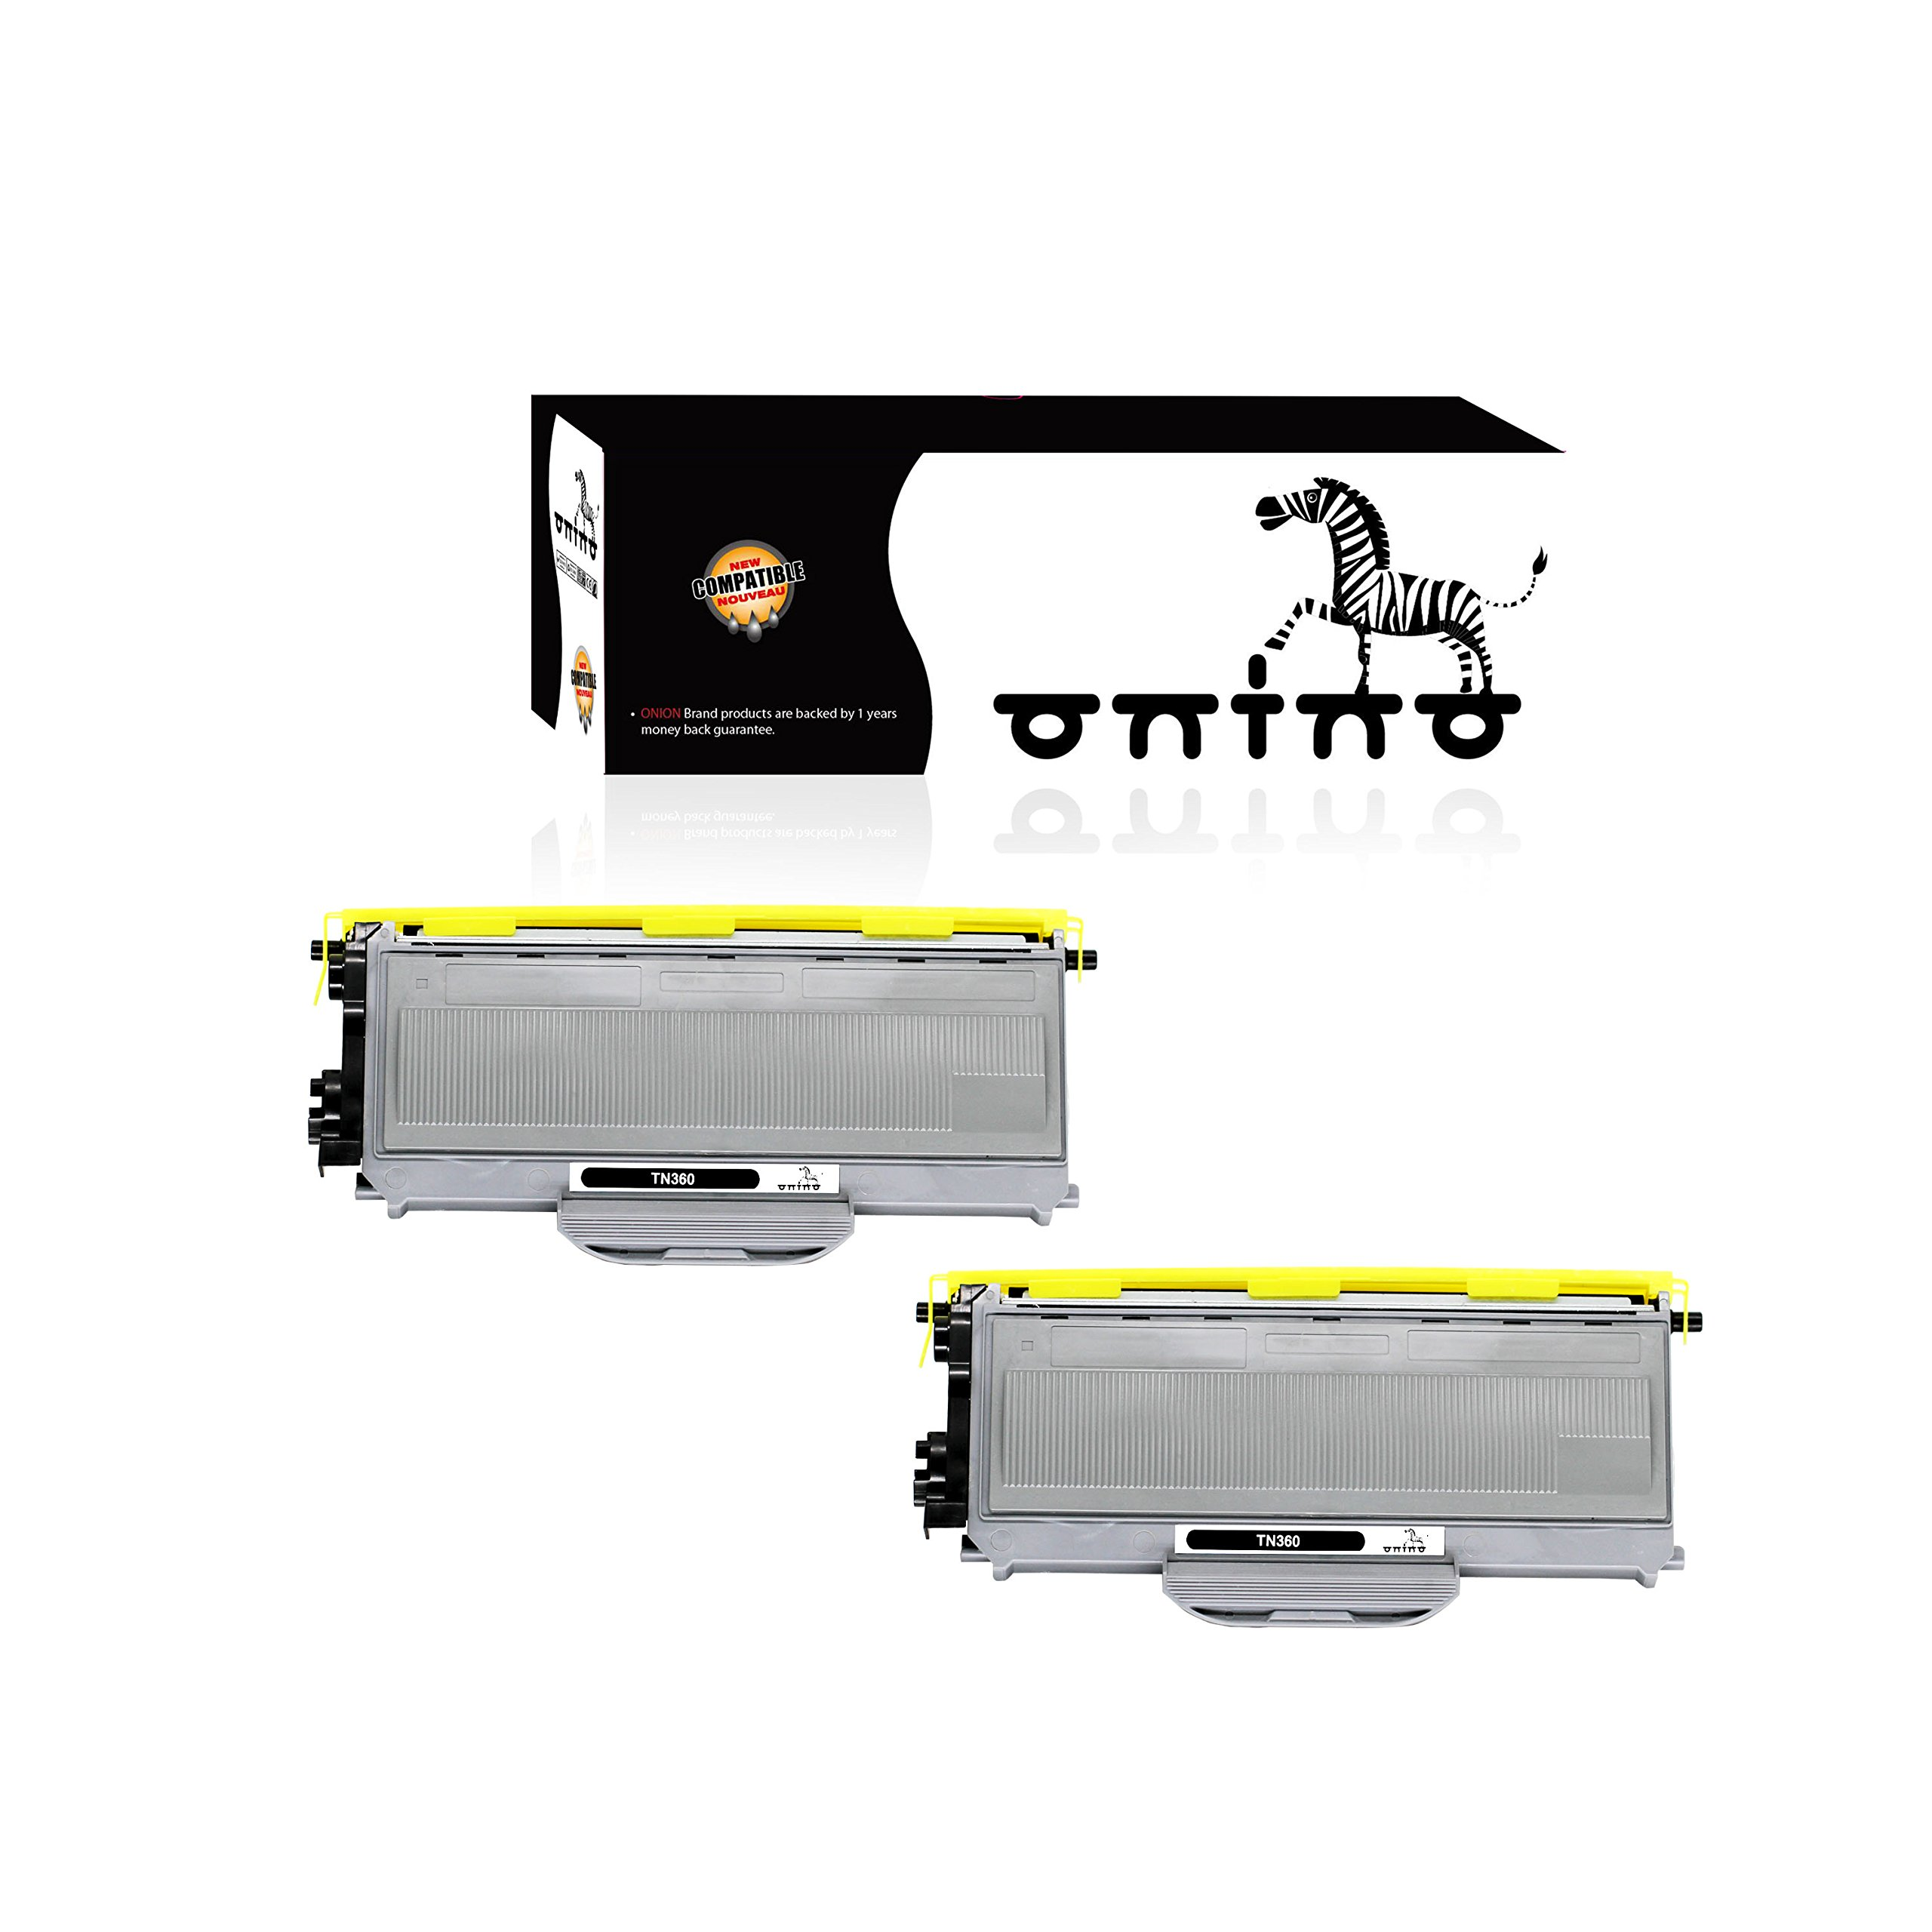 Toner Alternativo ( X2 ) Negro onino TN360 HL-2140 HL-2170W DCP-7030 DCP-7040 MFC-7340 MFC-7345N MFC-7440N MFC-7840W